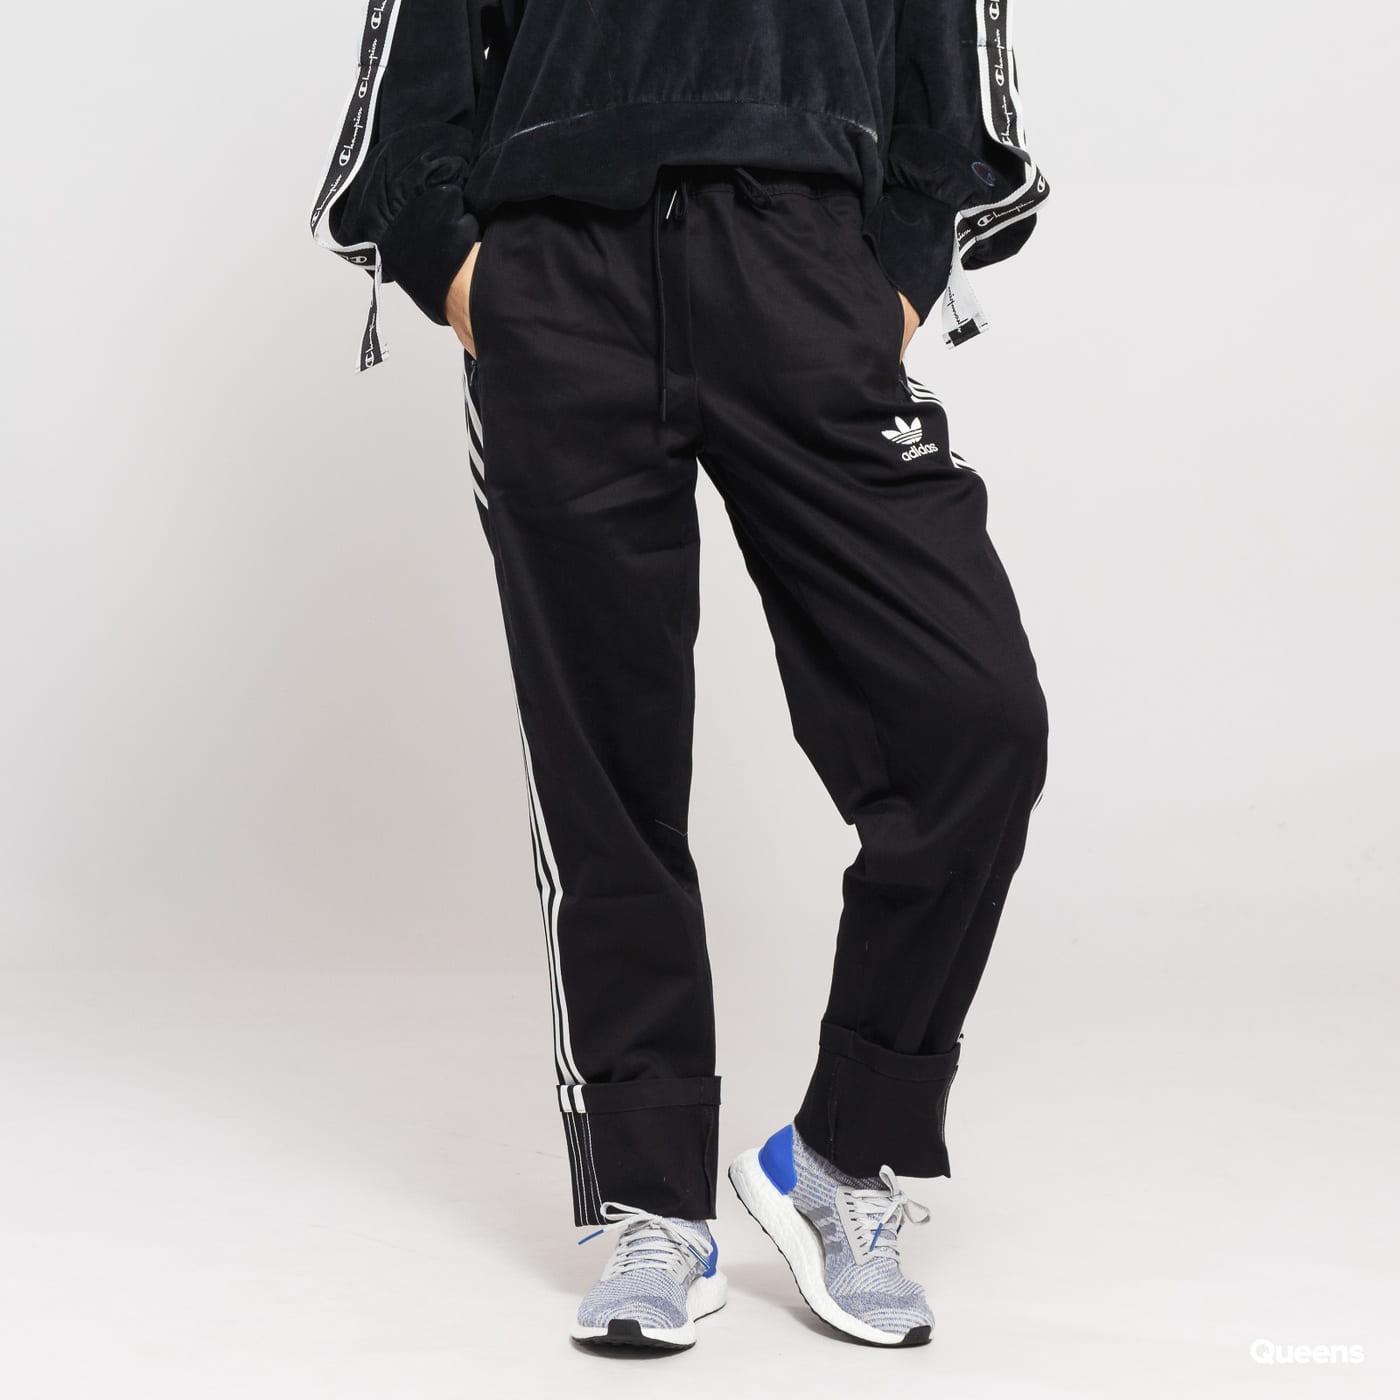 adidas Originals Colorado Pant black